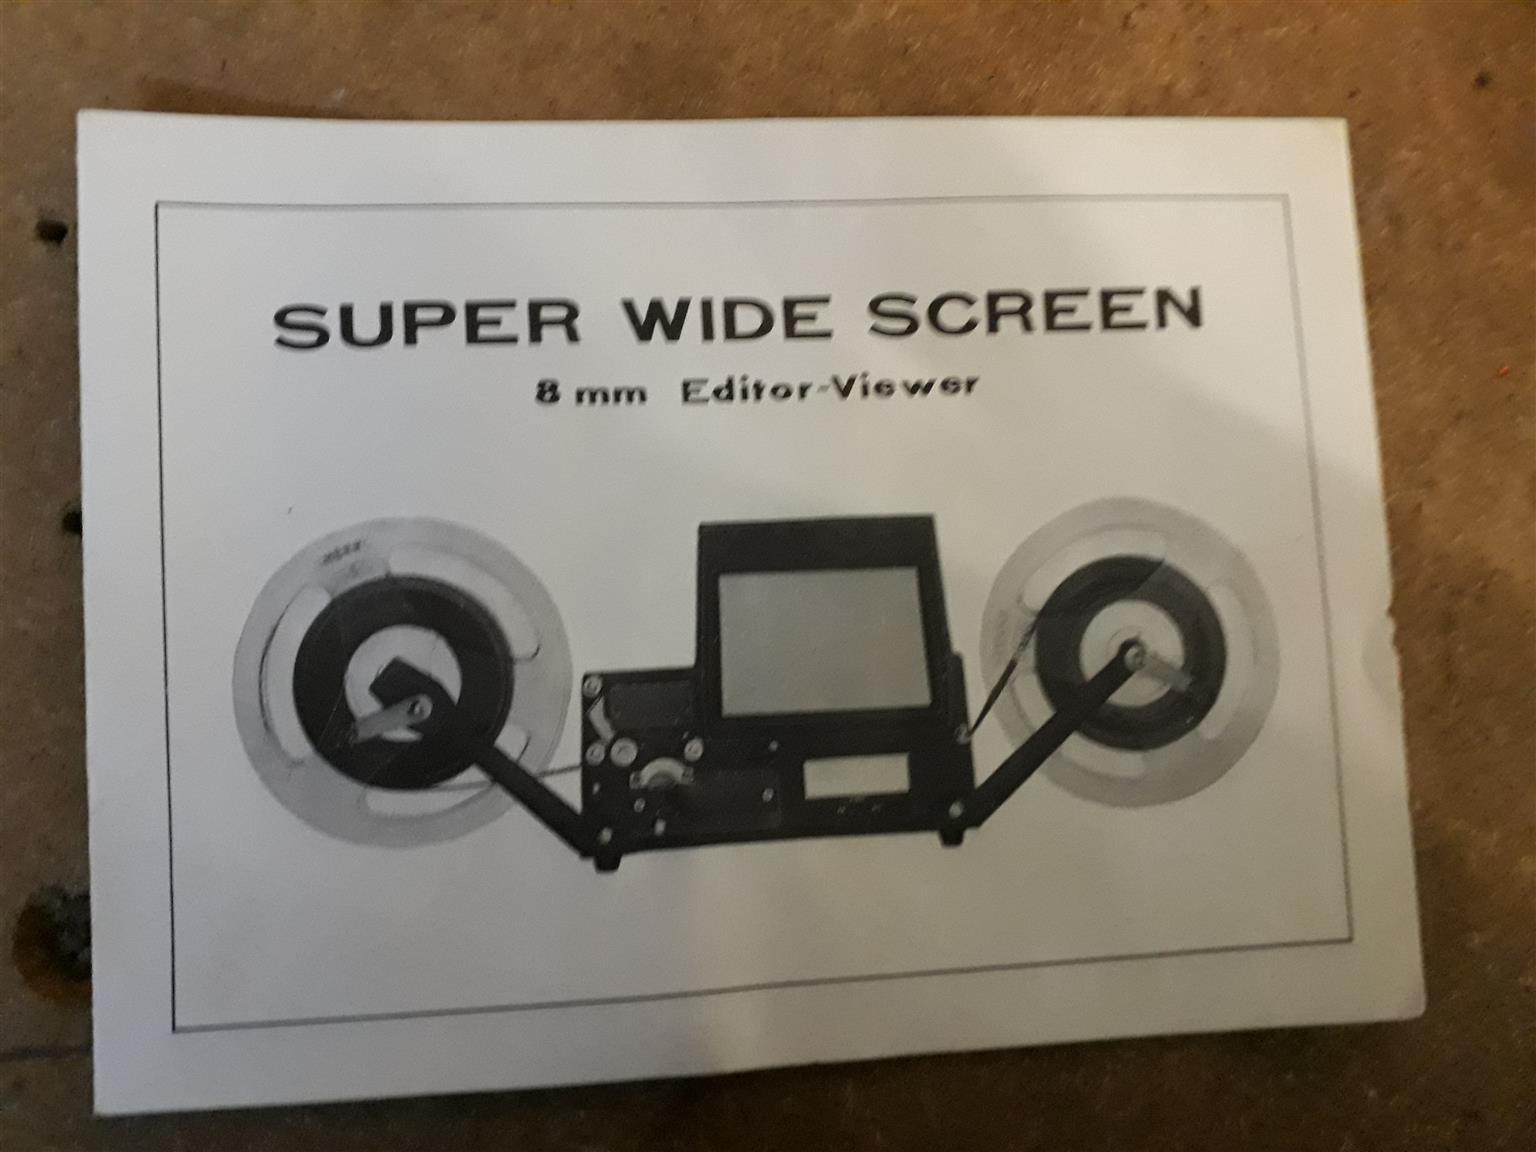 Editor Viewer 8mm